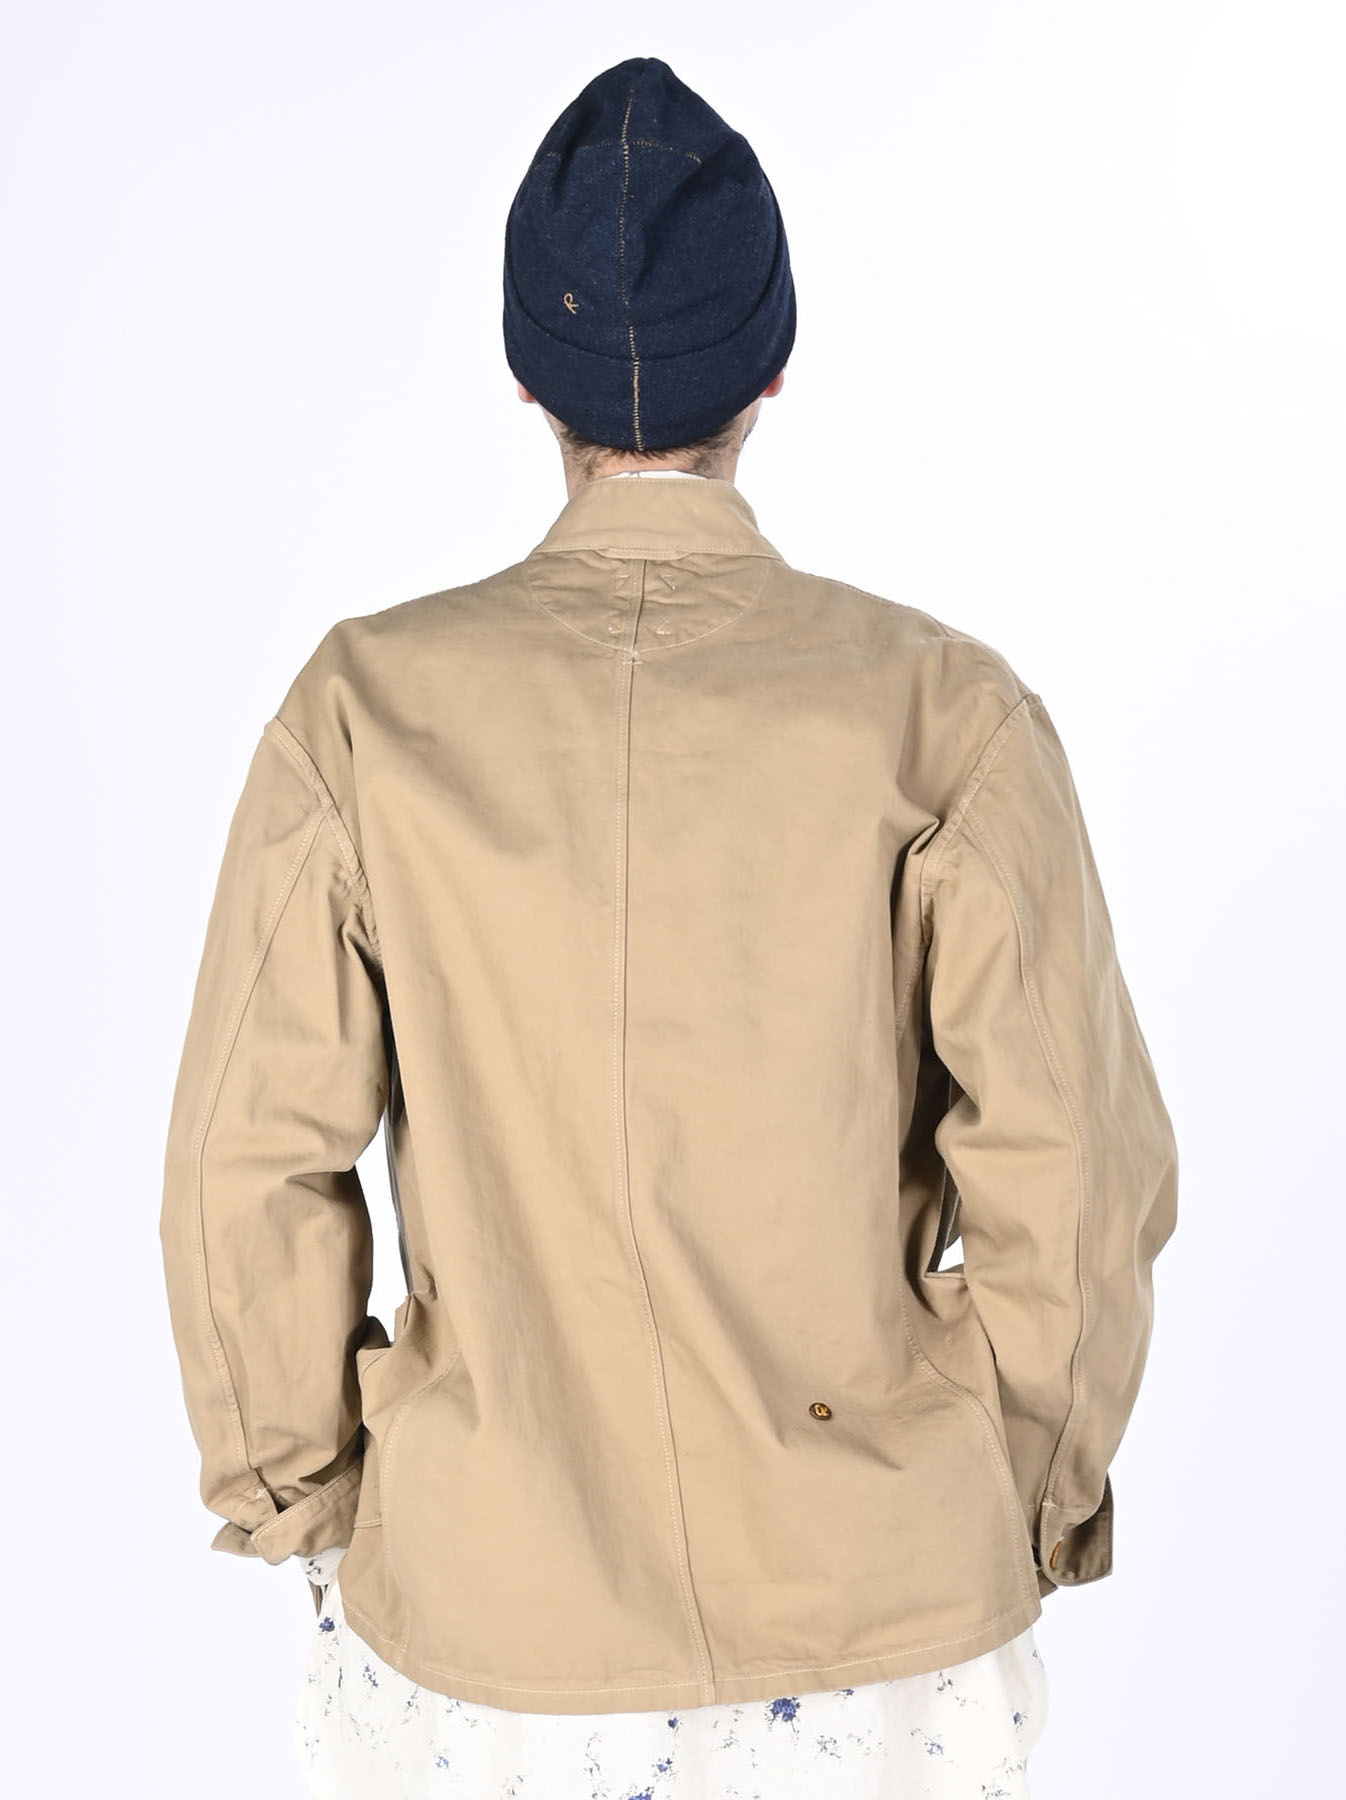 Okome Chino 908 Shirt Jacket-9